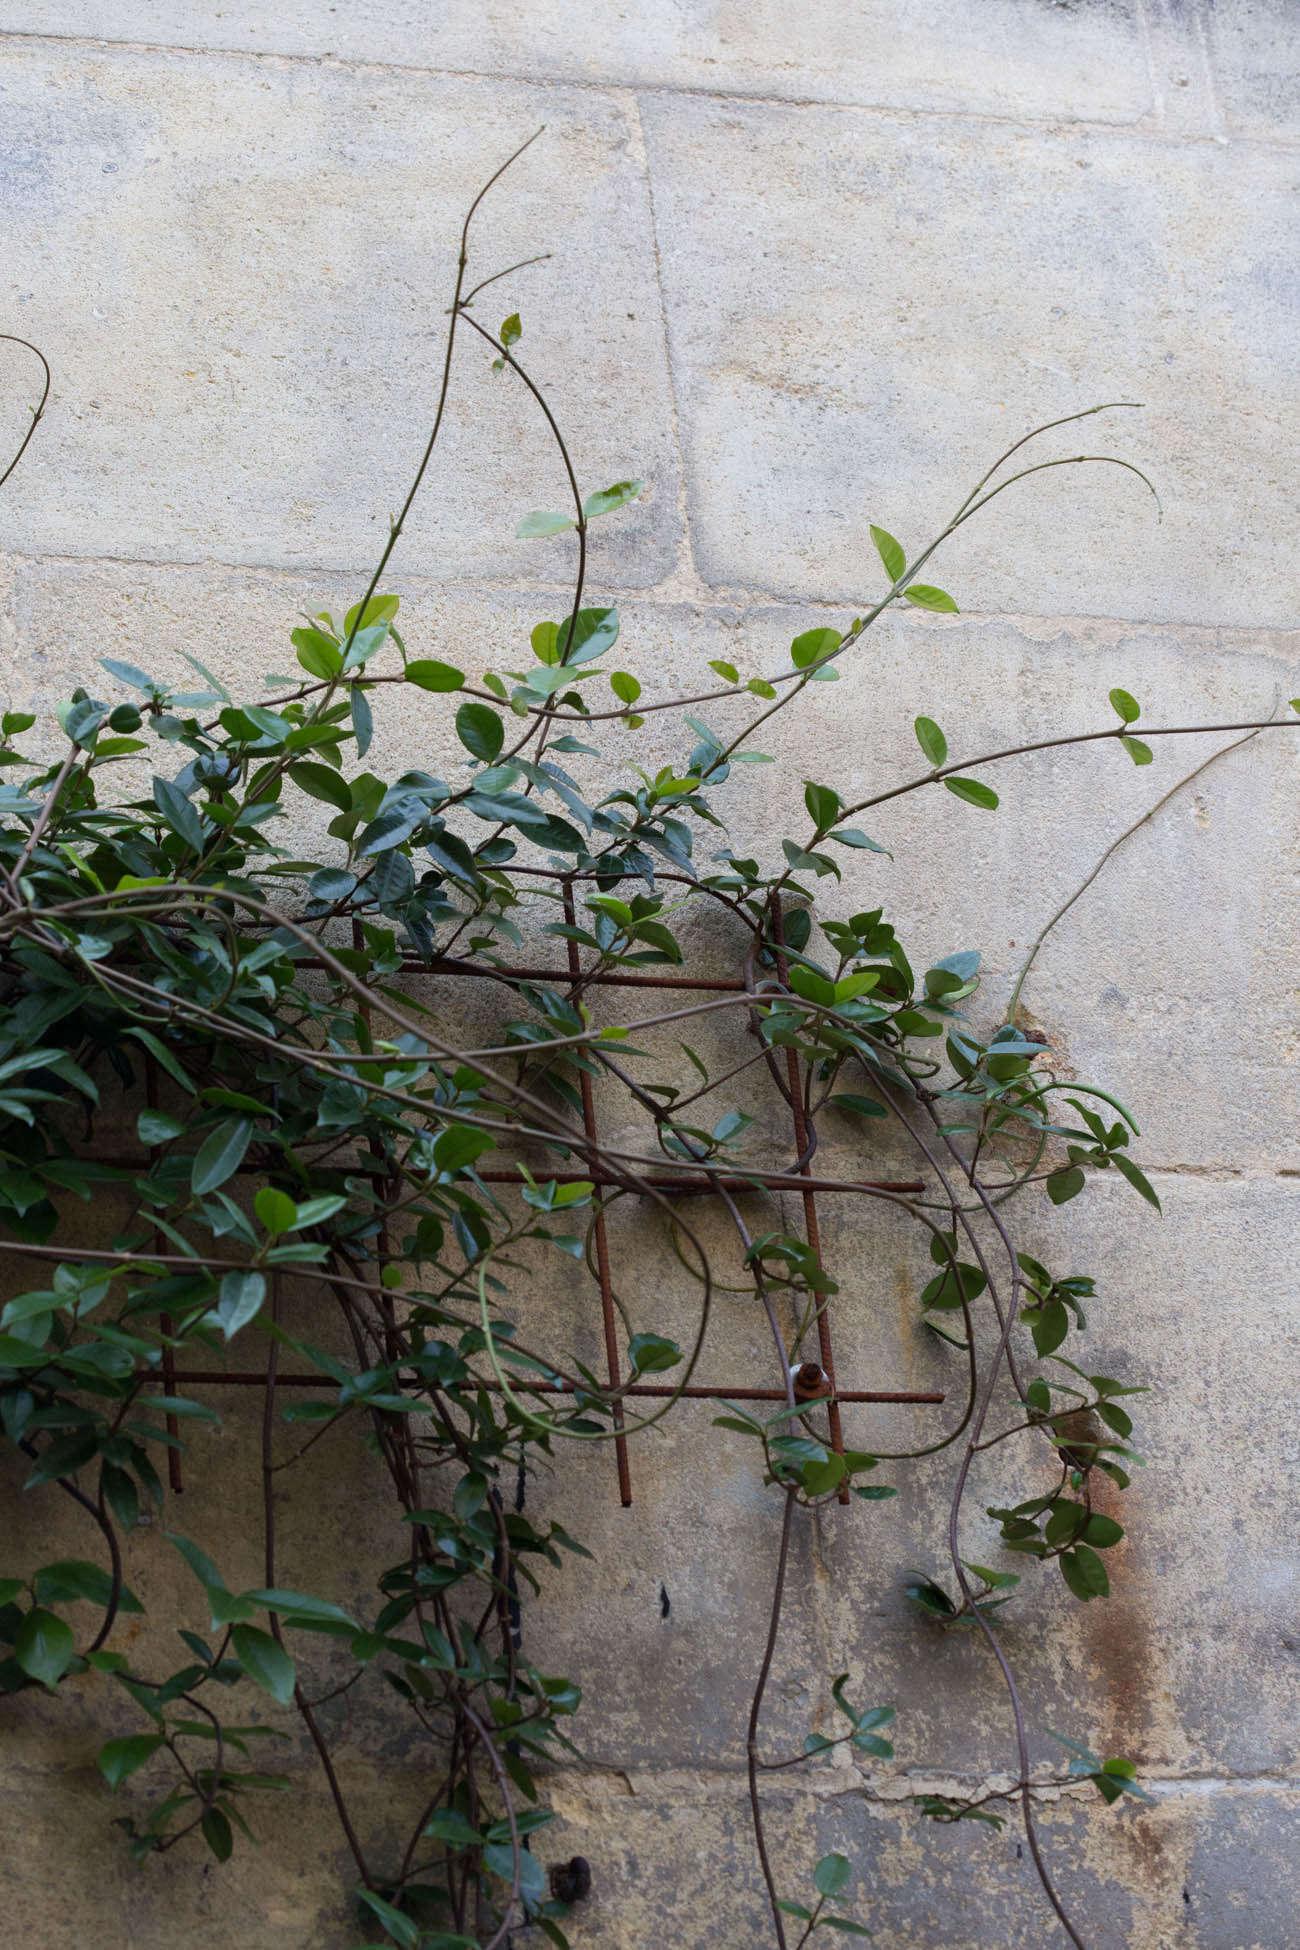 Ambre-store-france-mimi-giboin-gardenista-033